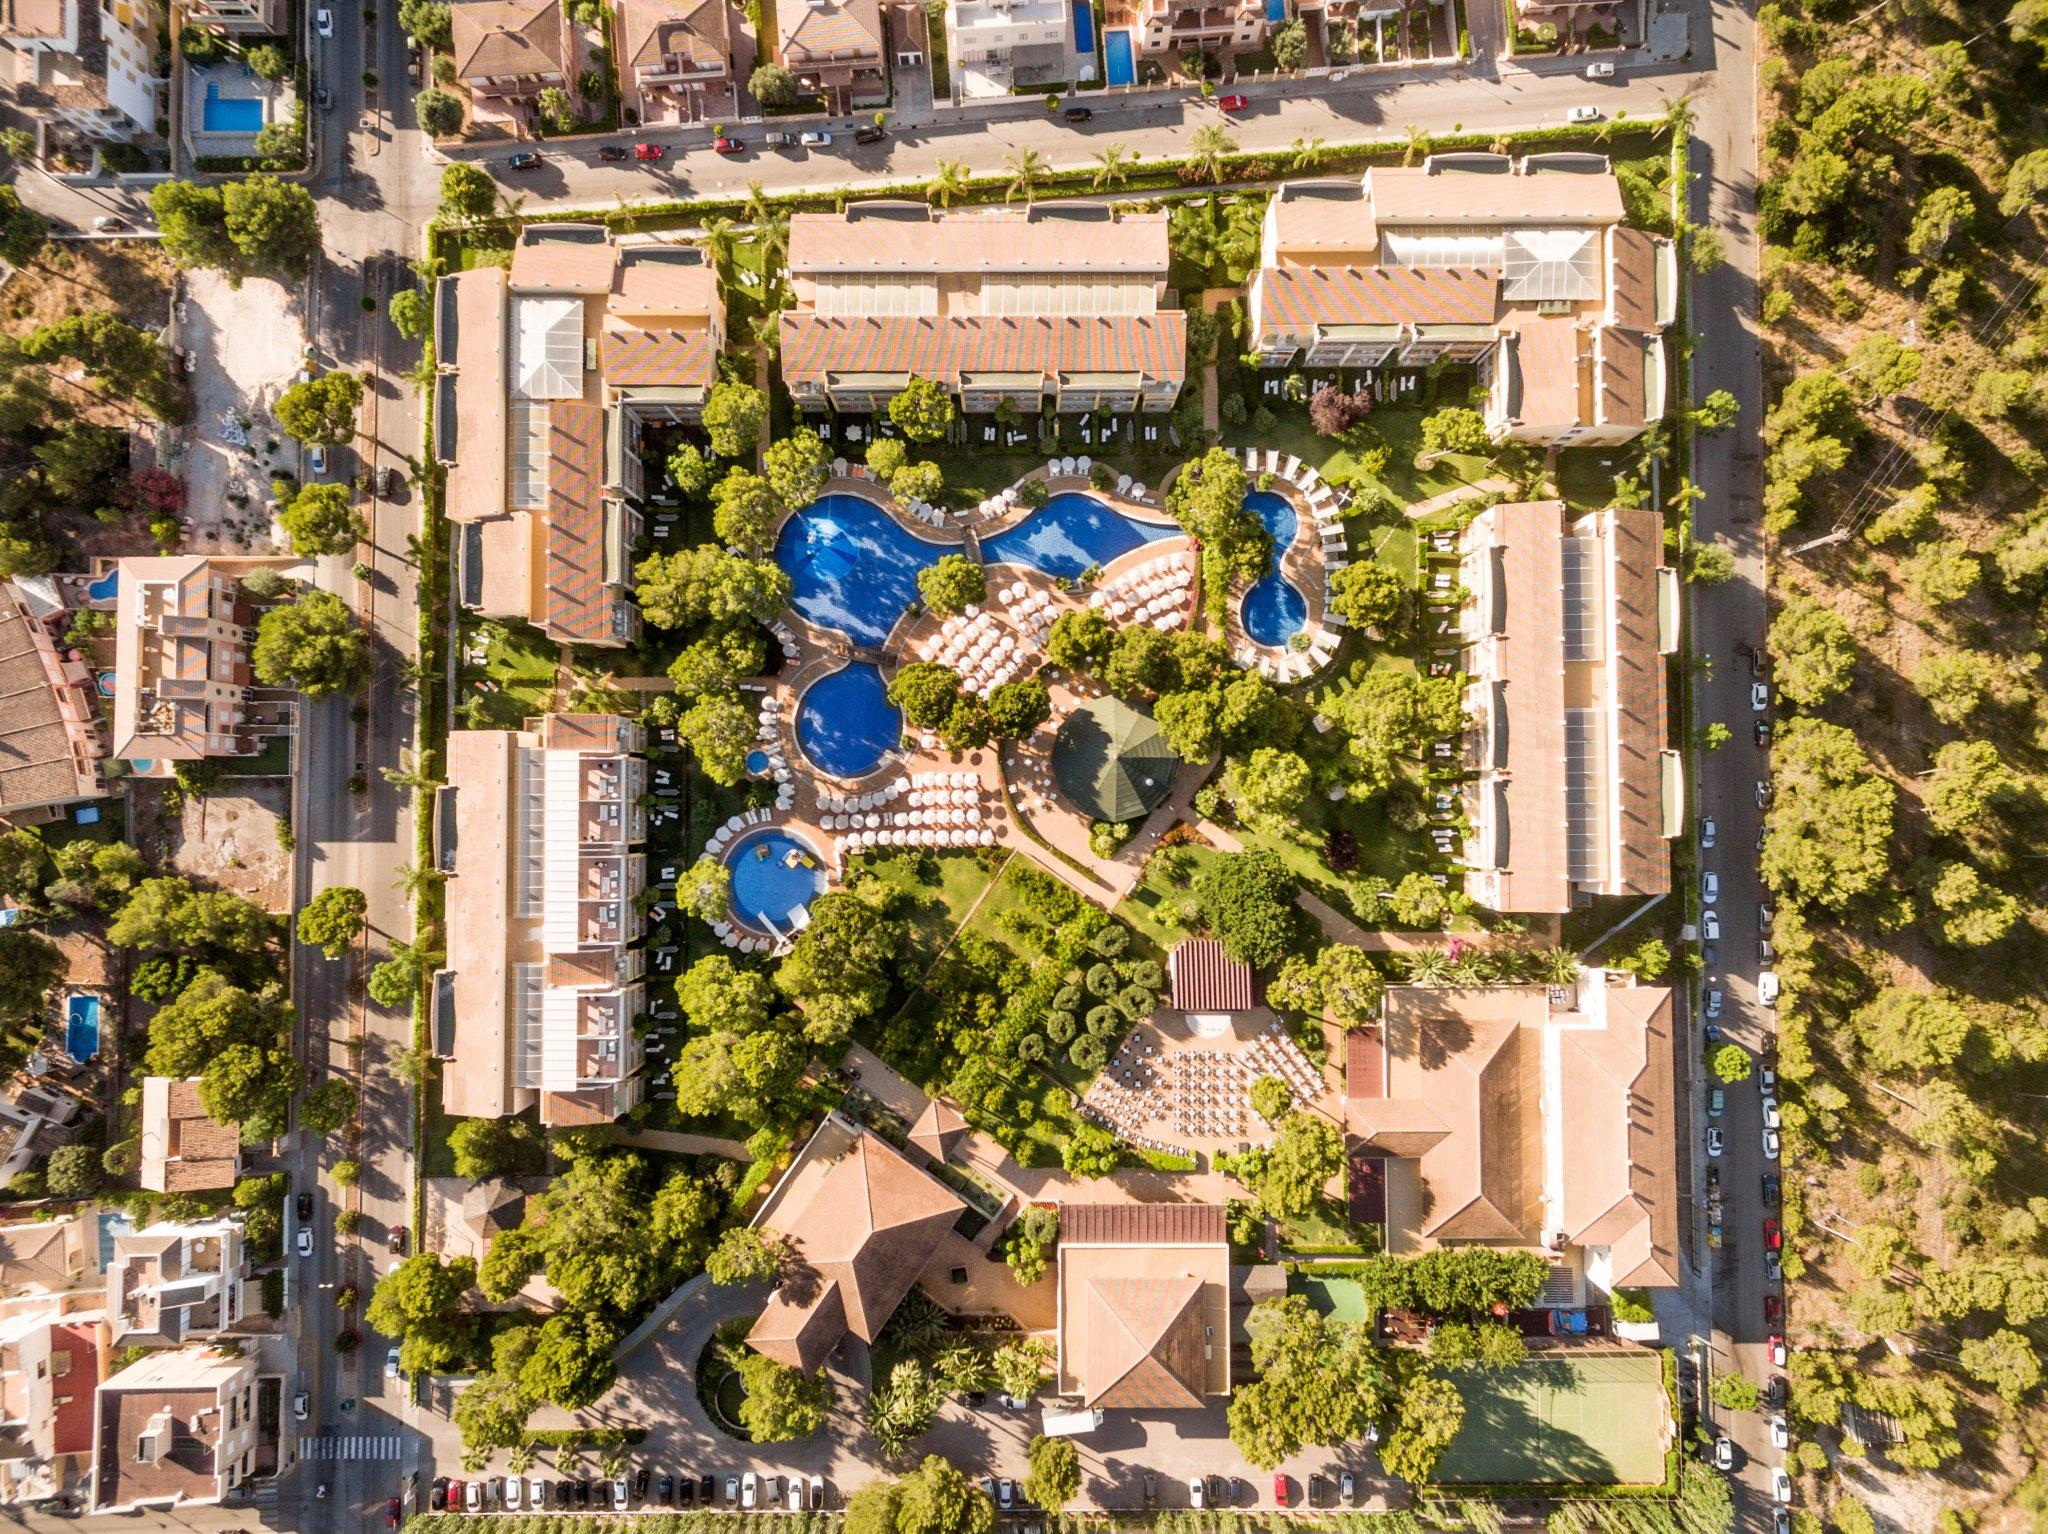 Bentley Alquiler venta renting coches de lujo en Palma de Mallorca